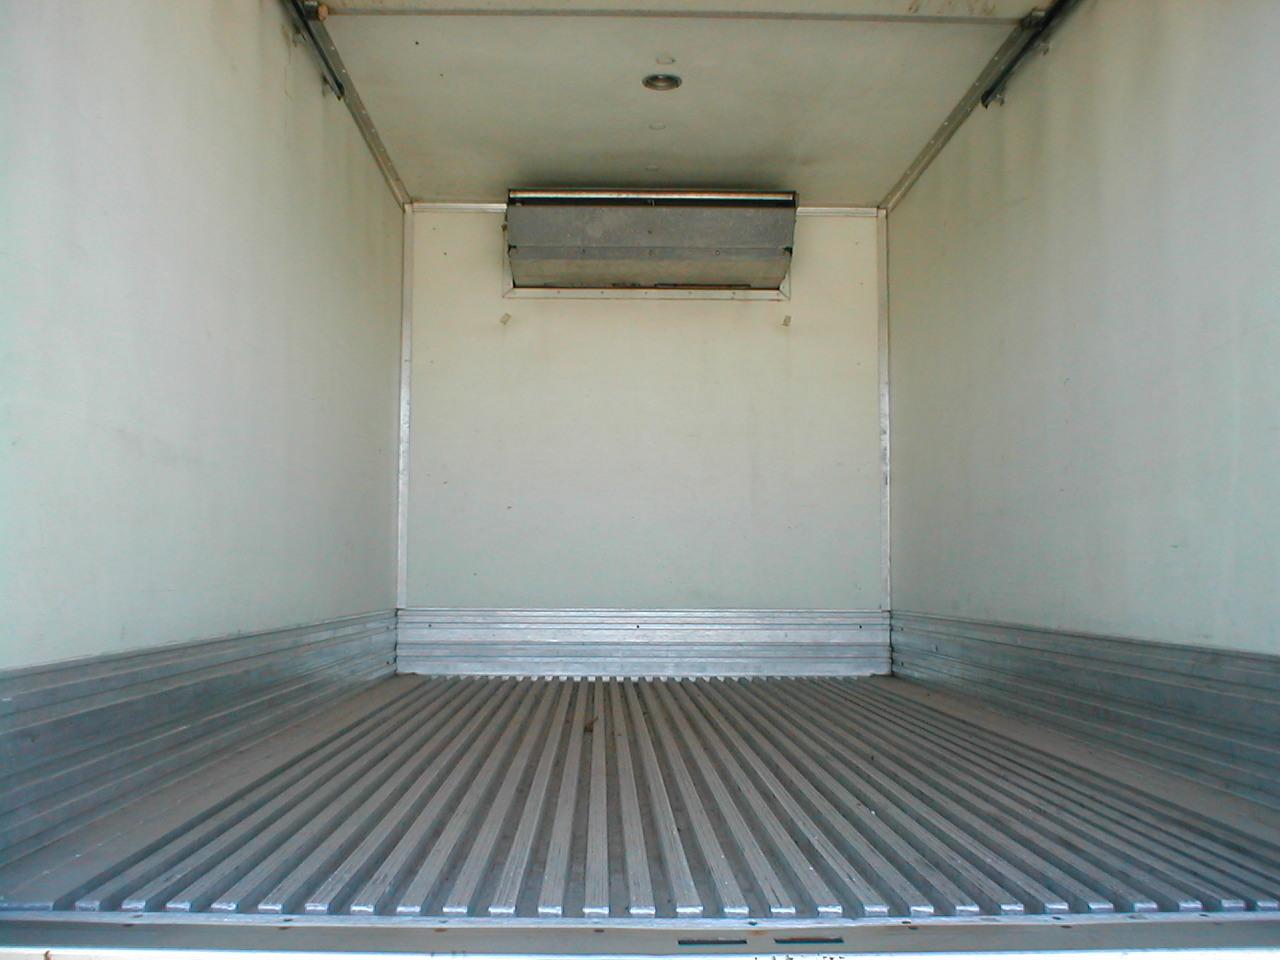 1999 GMC W4500 refrigerated van